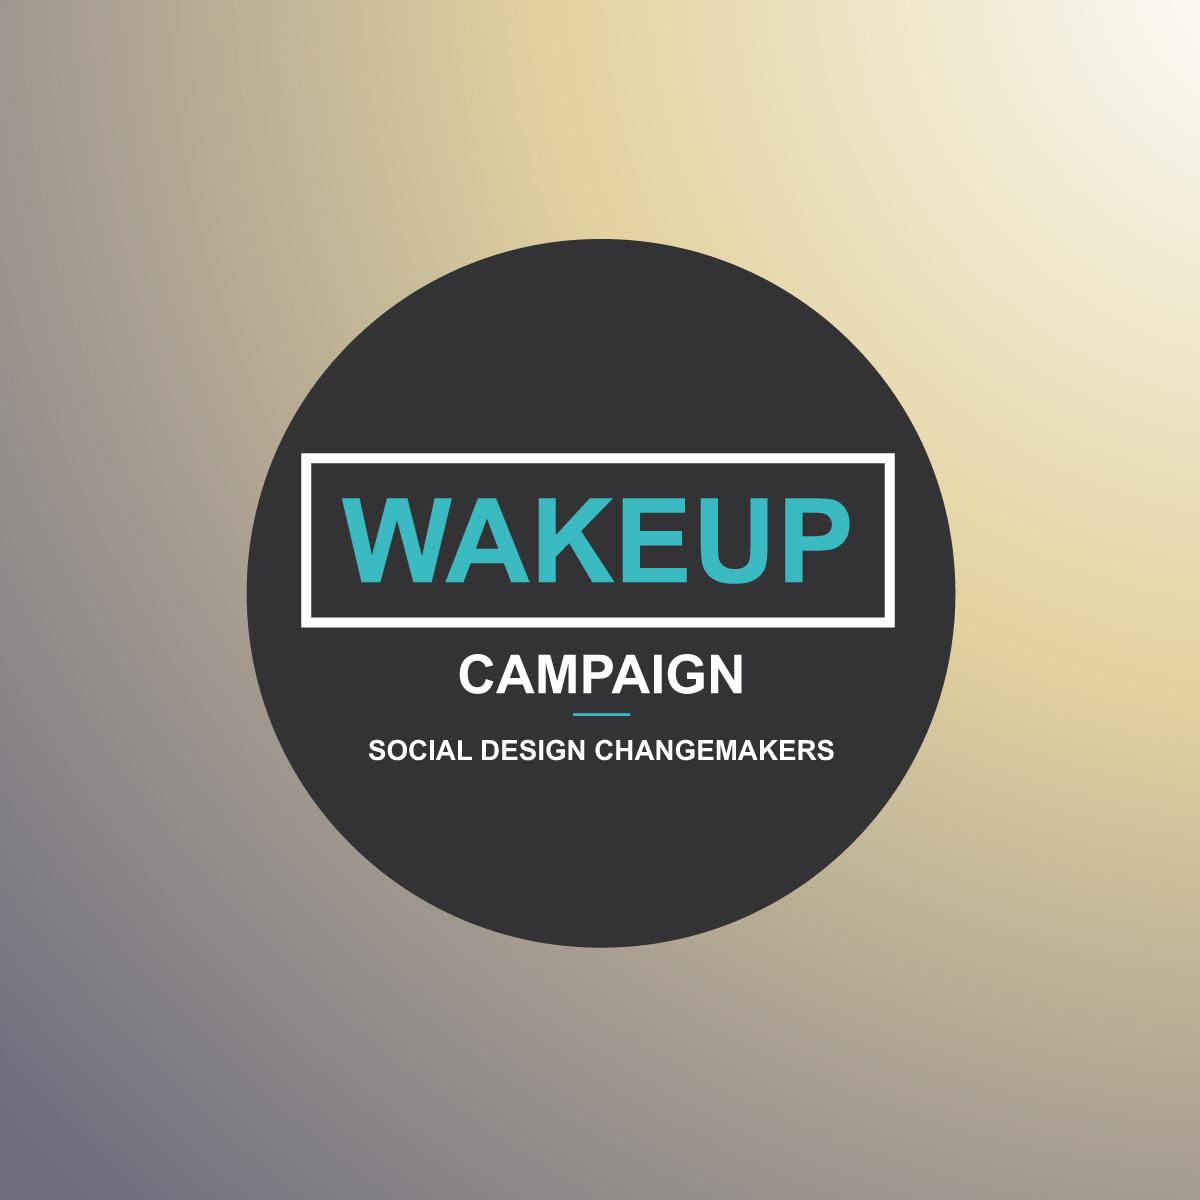 Wakeup Campaign logo design by Viviane Williams Consultancy